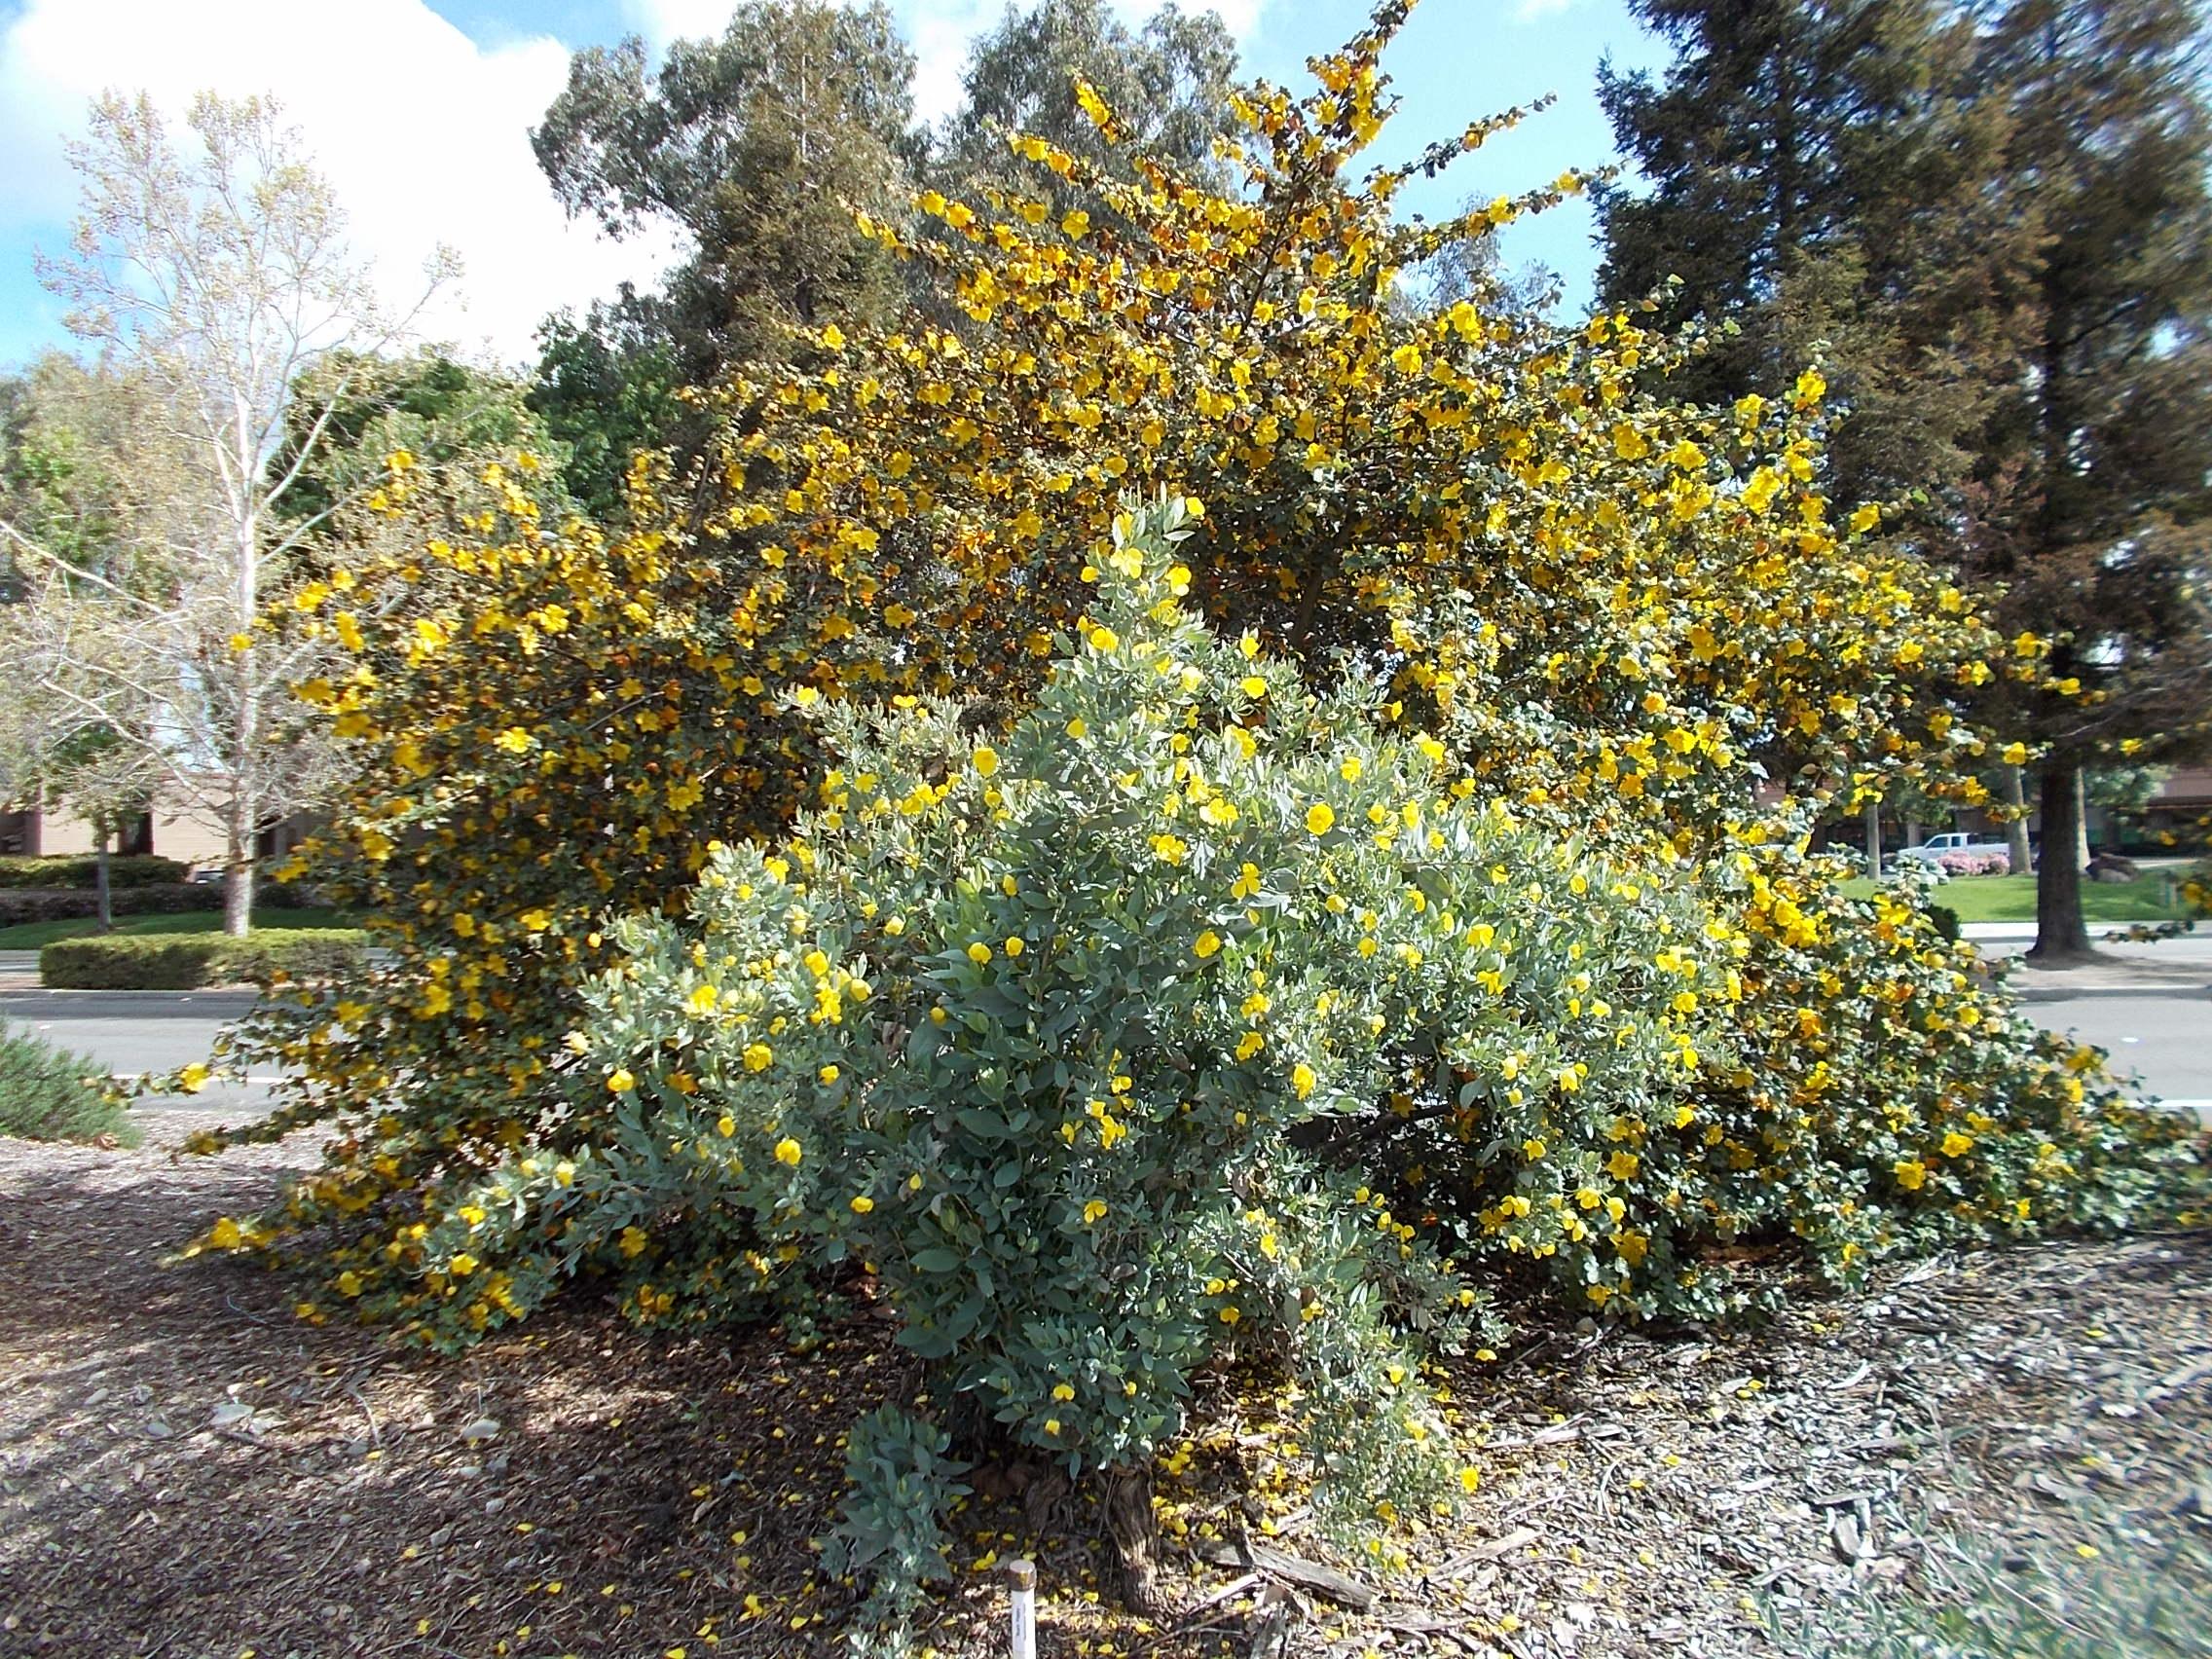 The Granada Native Garden Newsletter